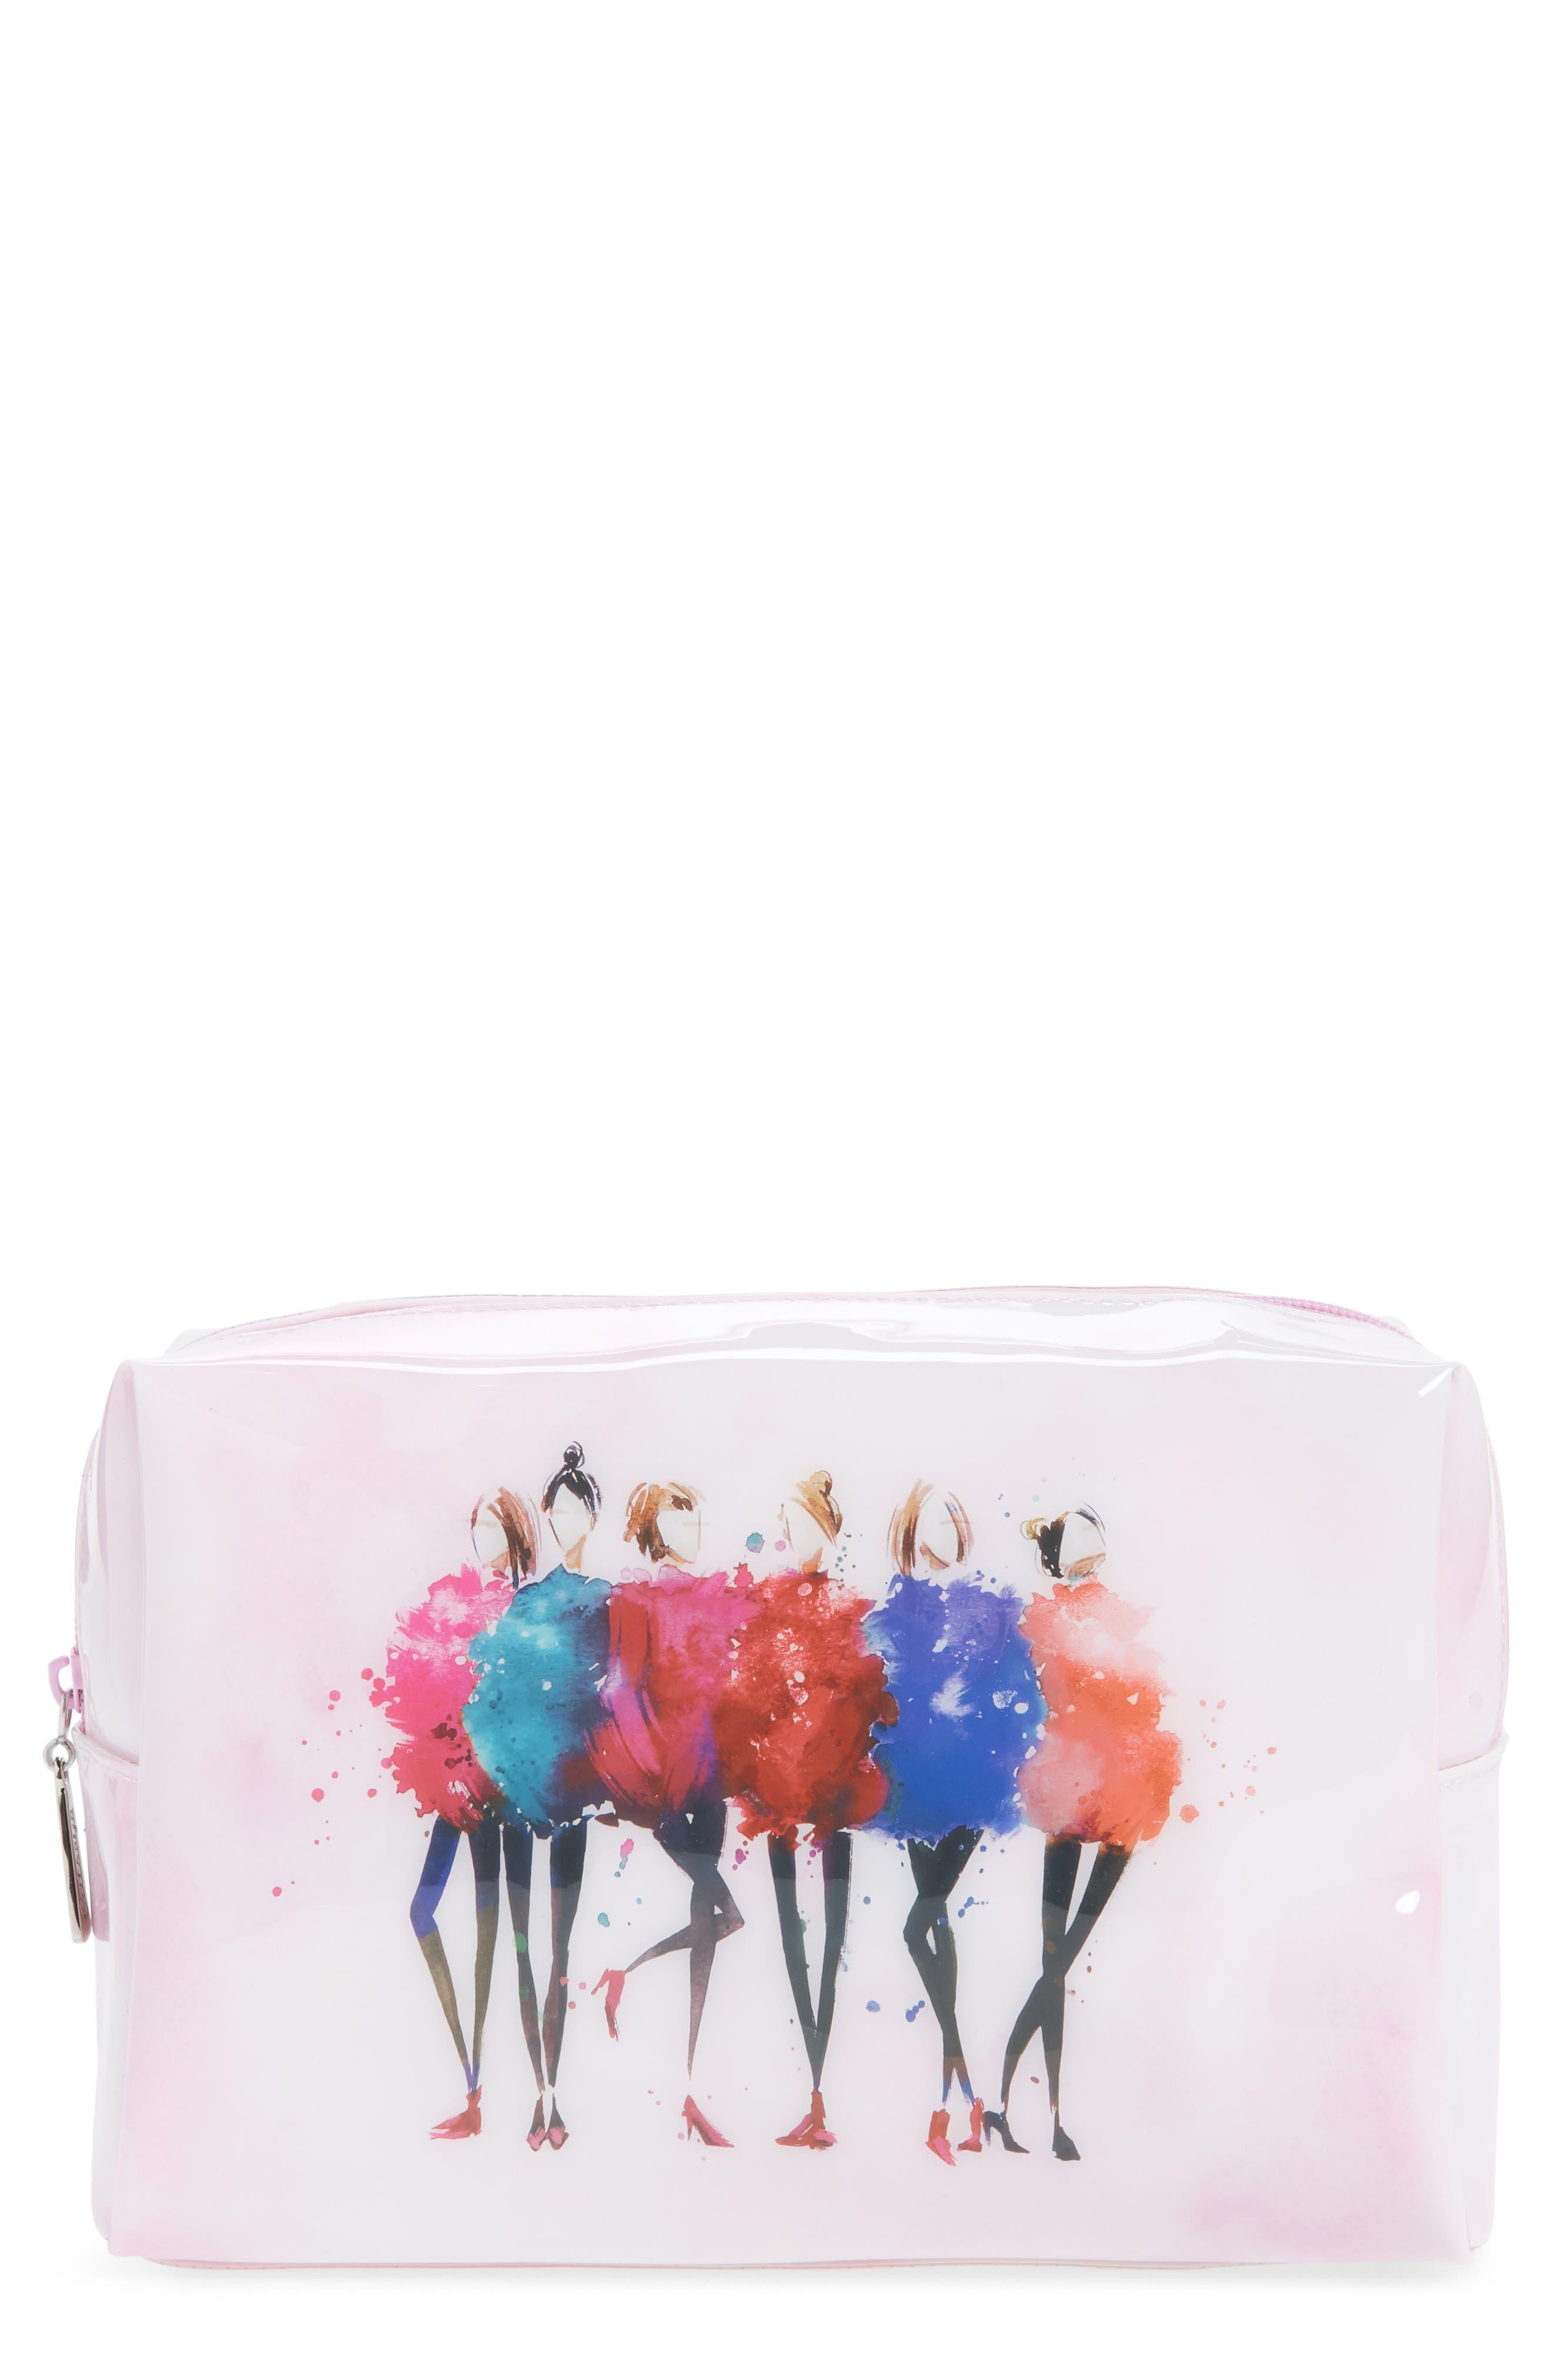 Catseye London Watercolor Women Large Cosmetics Case